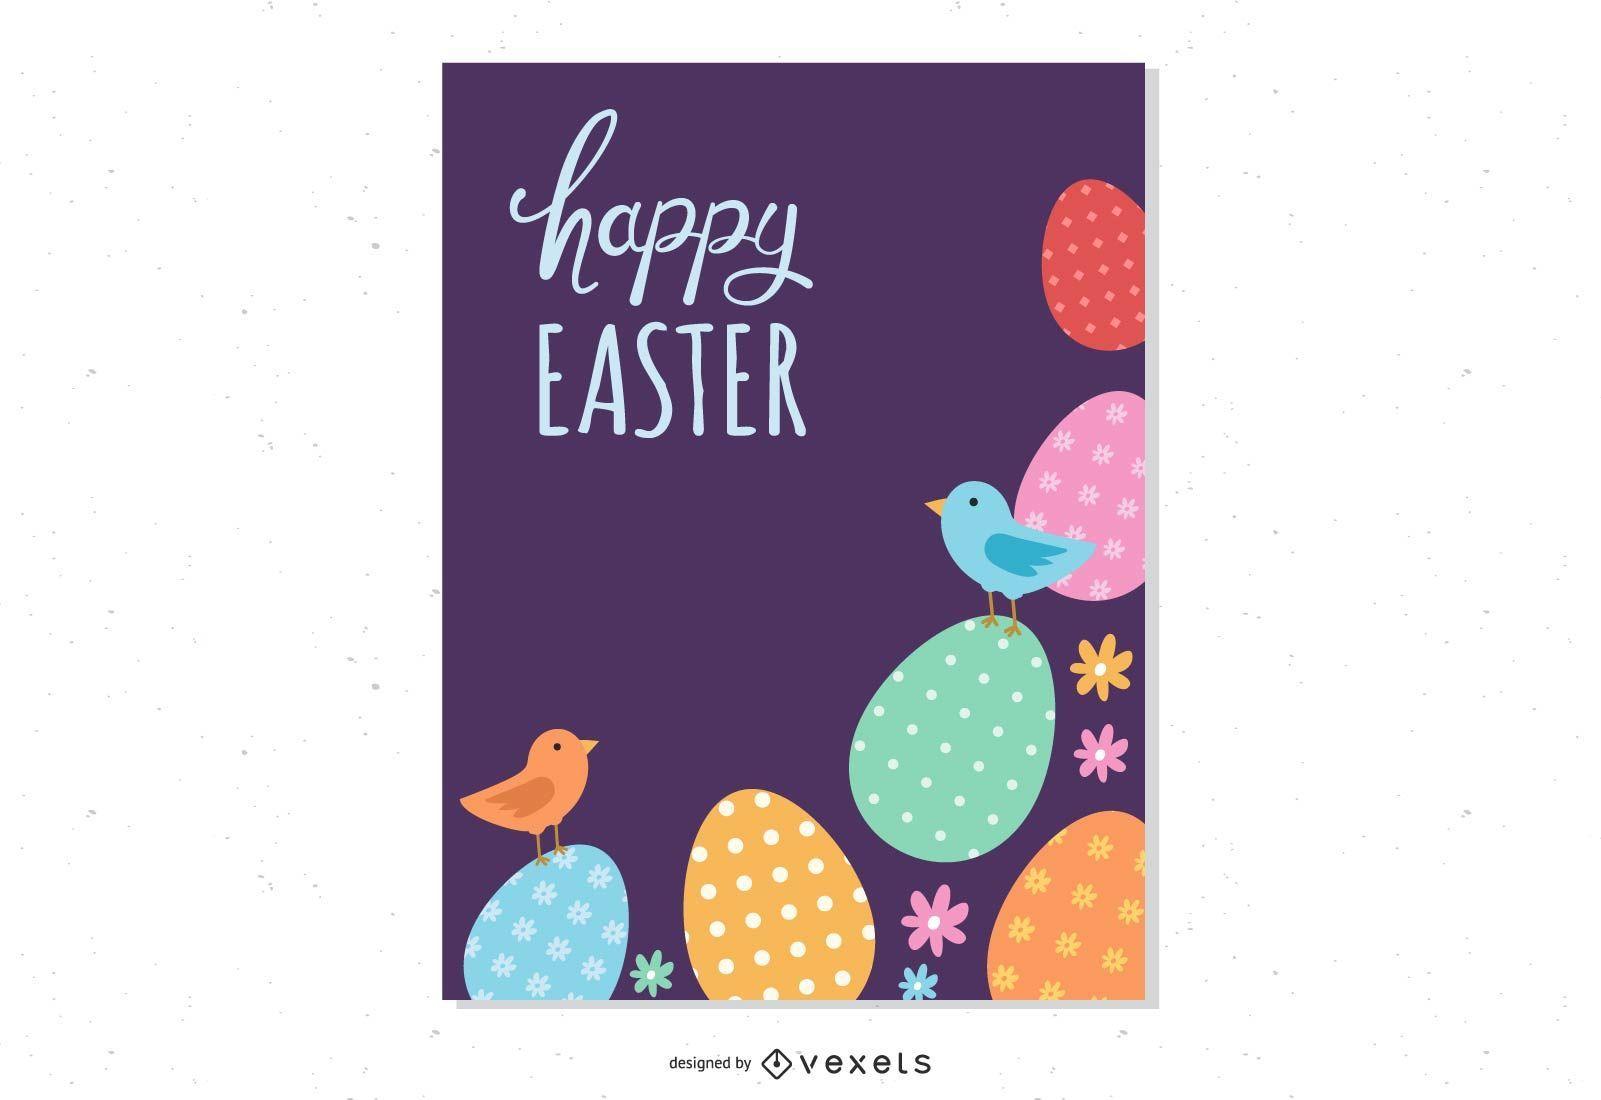 Happy Easter Egg Poster Design